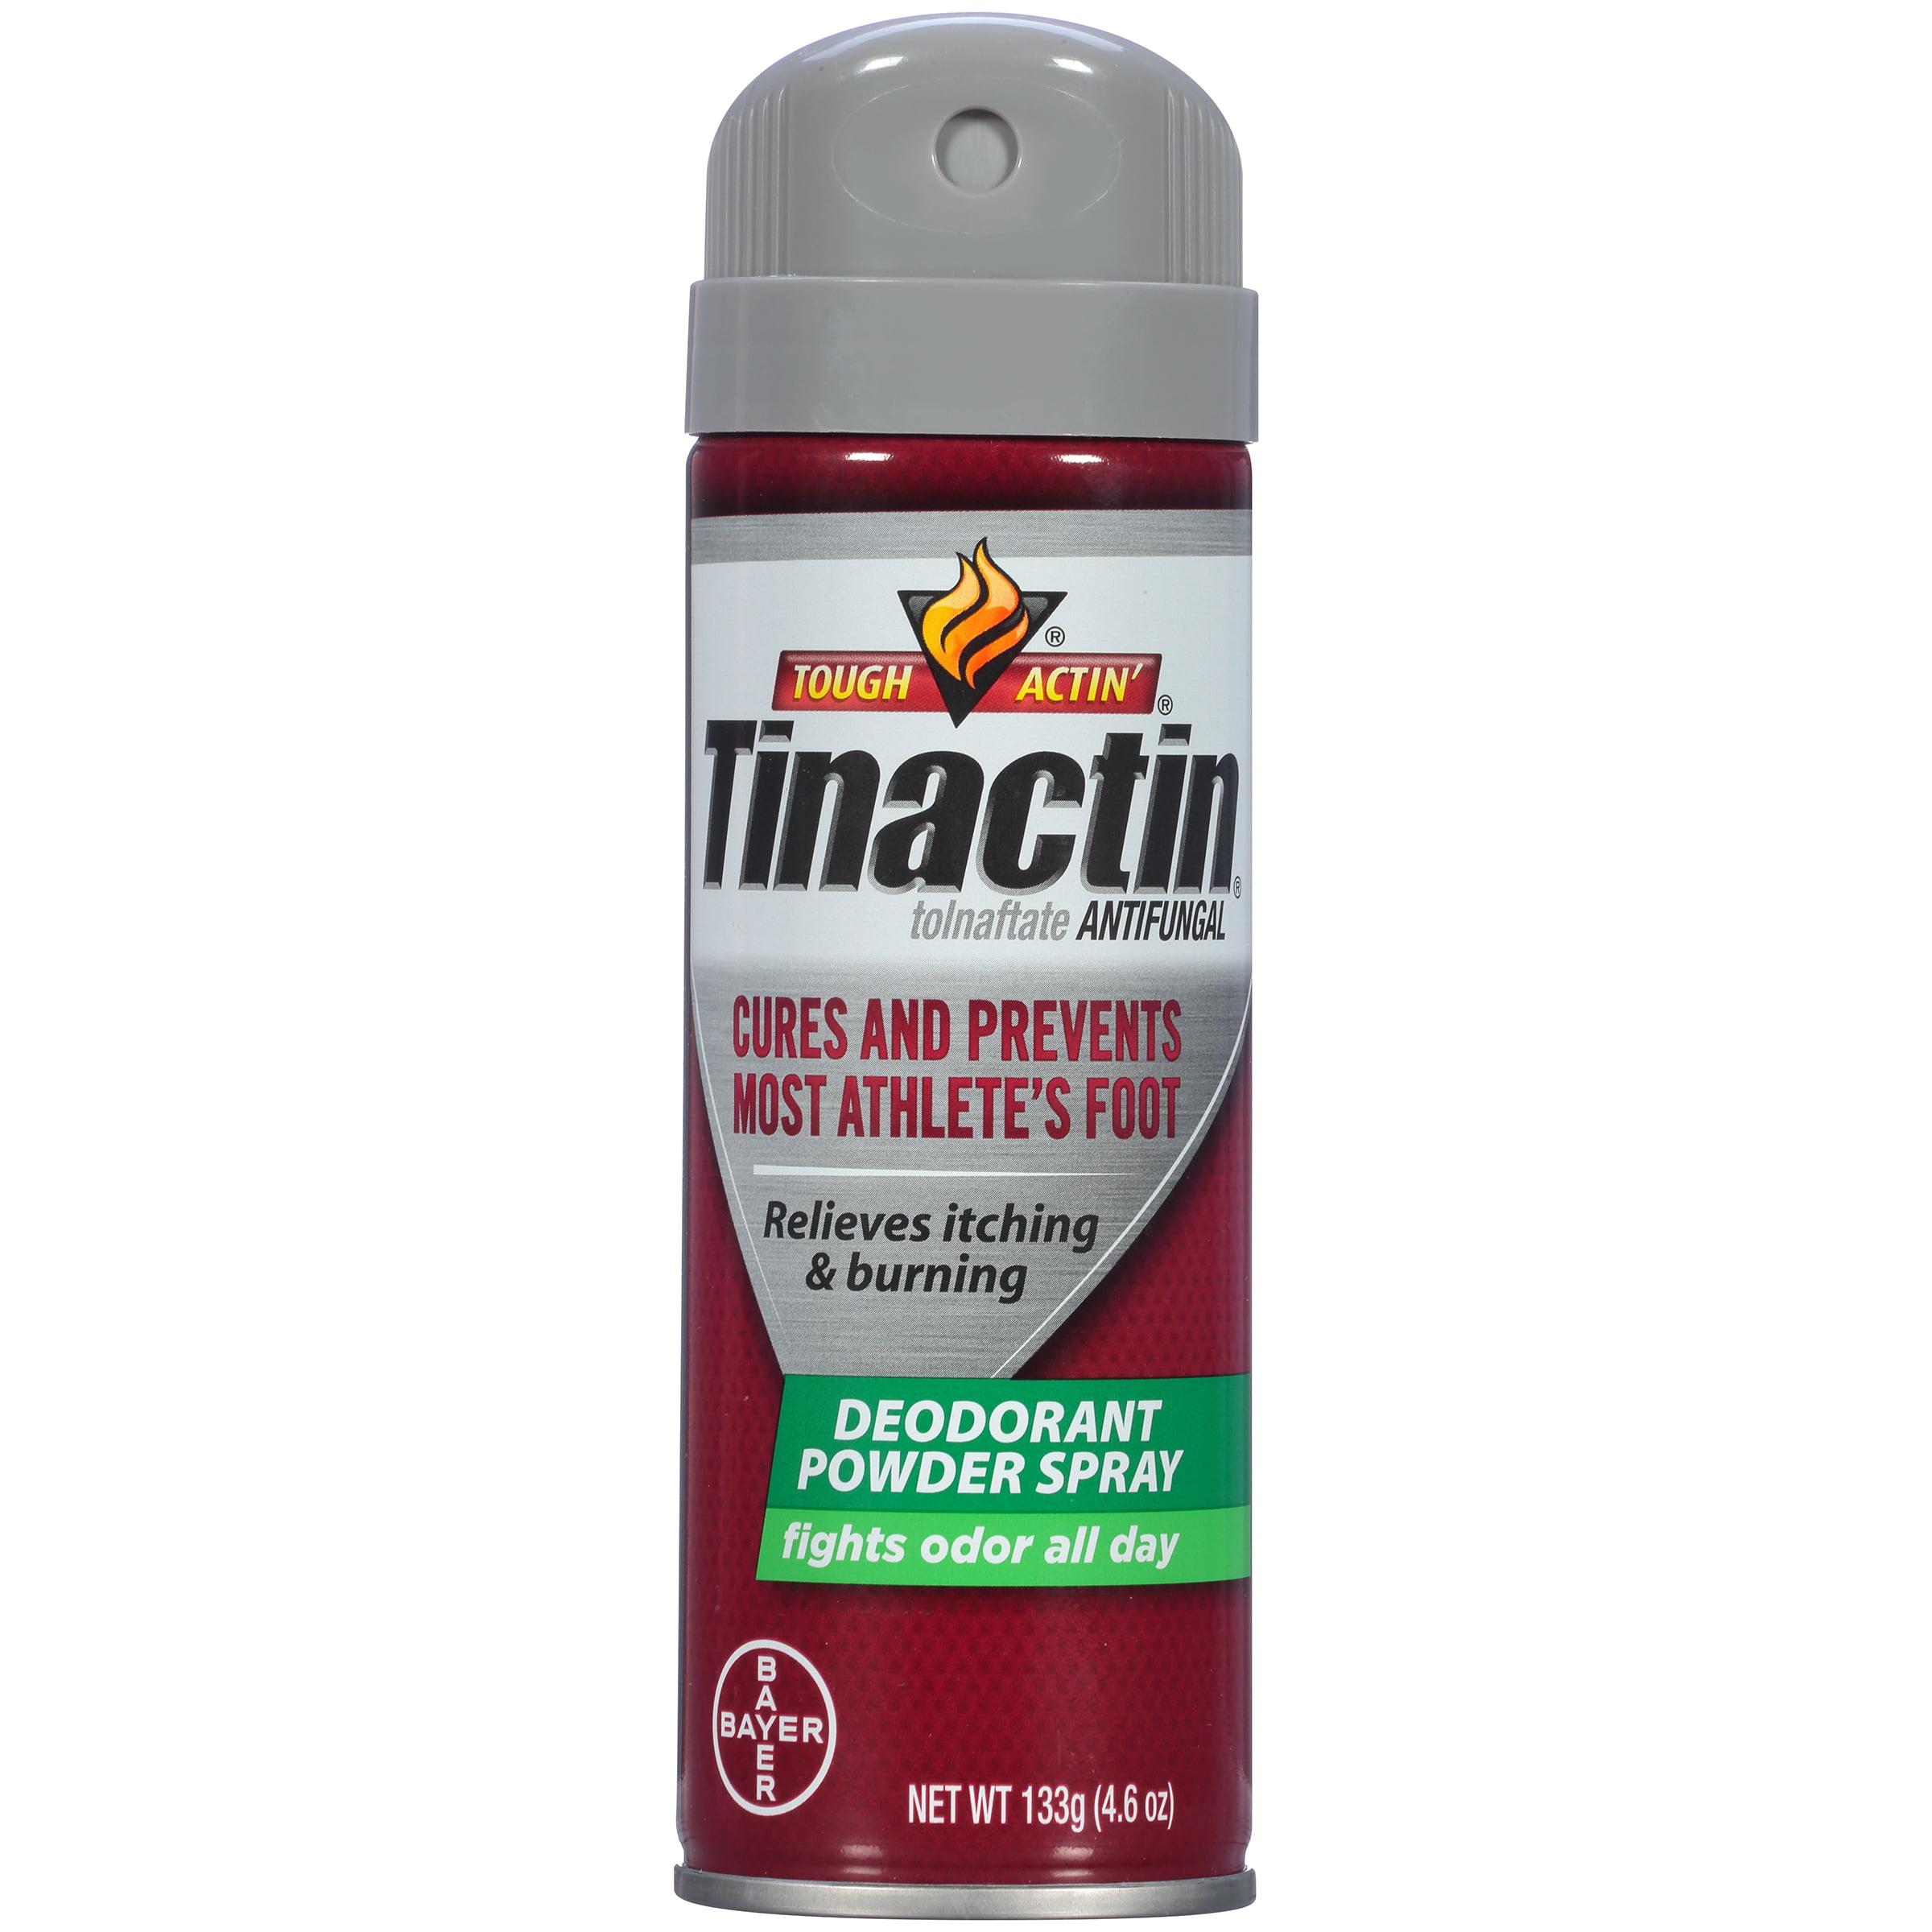 Tinactin Athlete's Foot Antifungal Deodorant Powder Spray, 4.6 oz Can